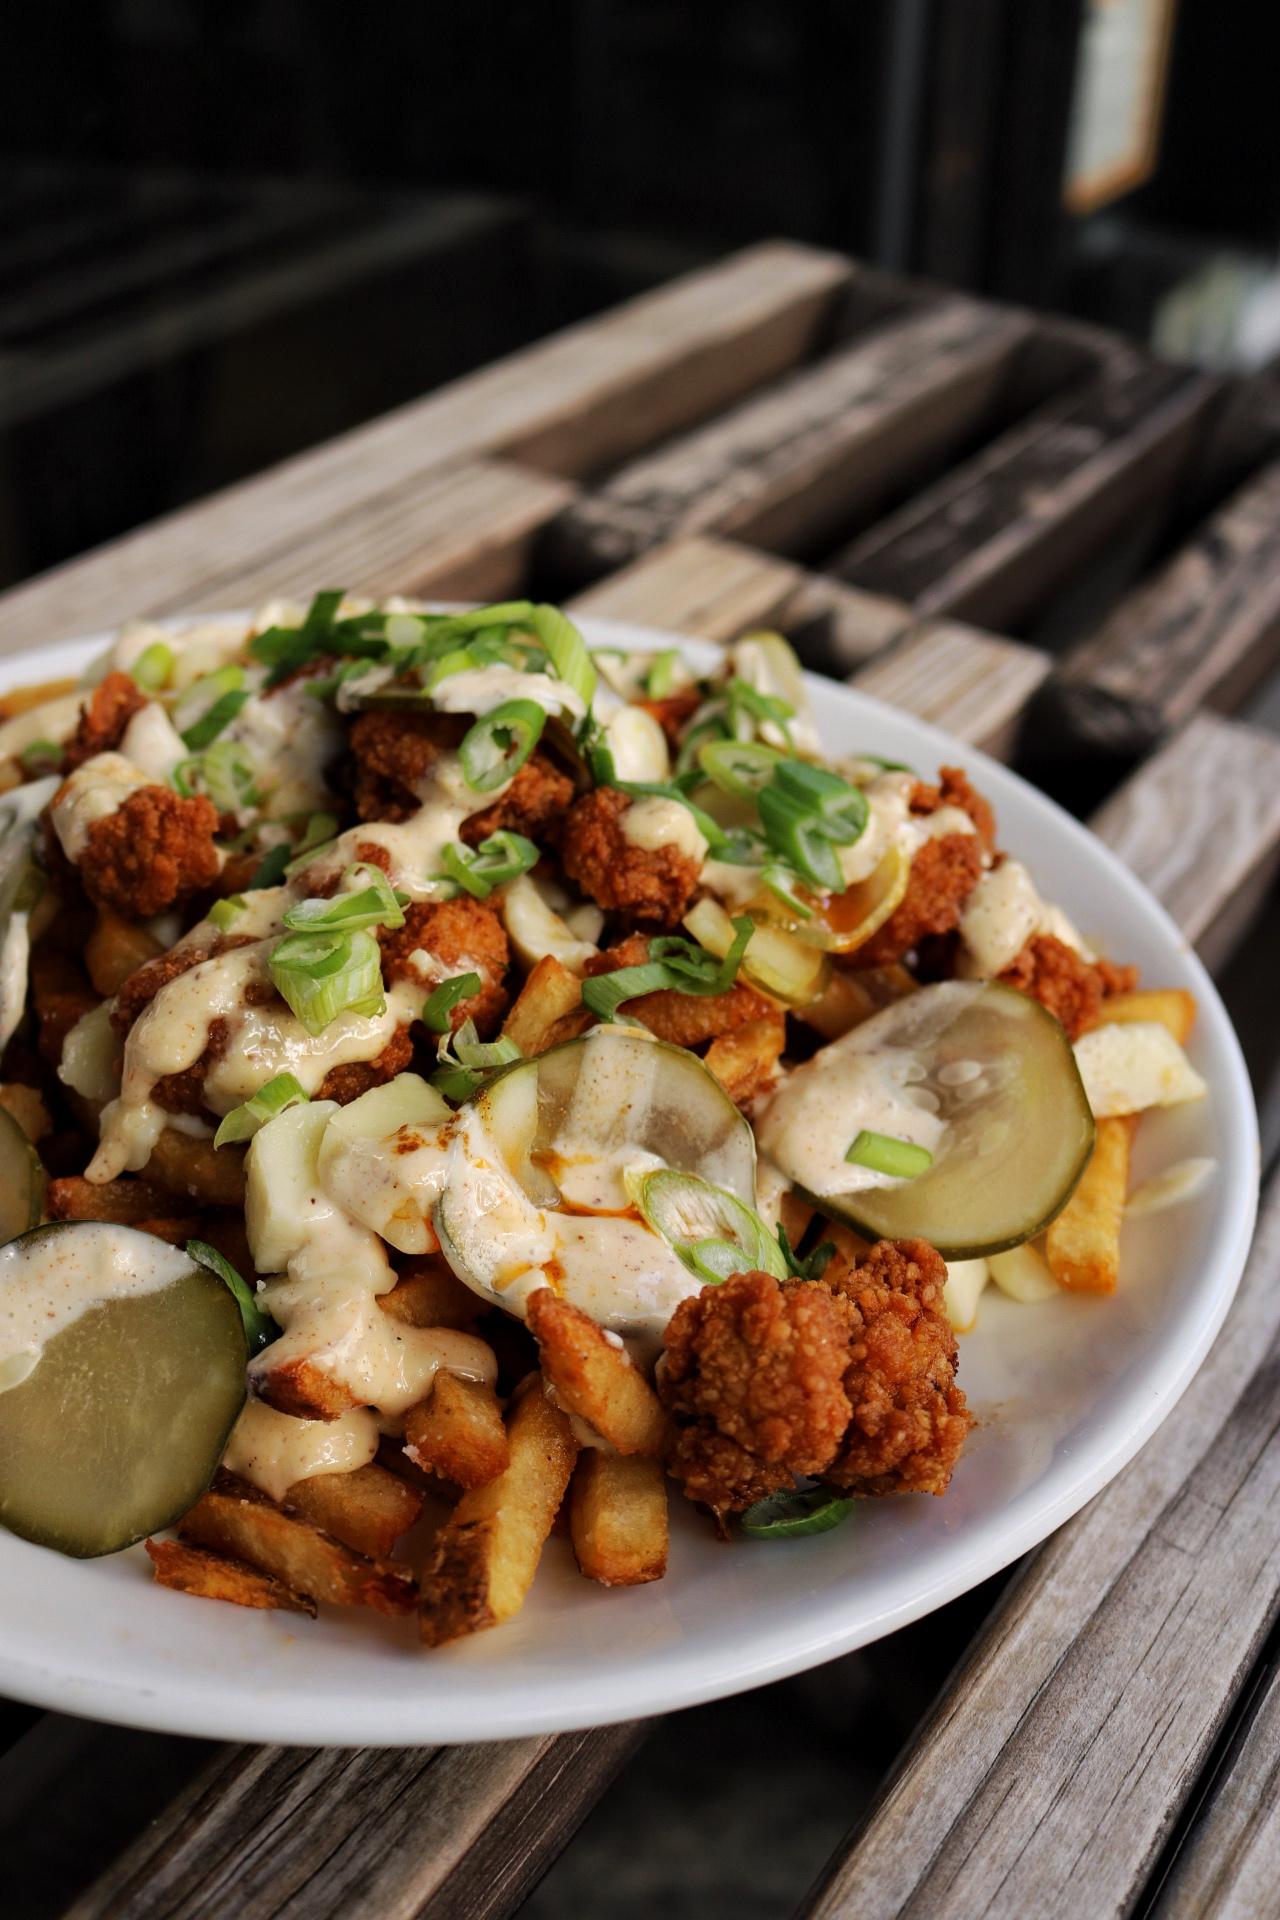 Nashville Hot Chicken Poutine Mile End Deli